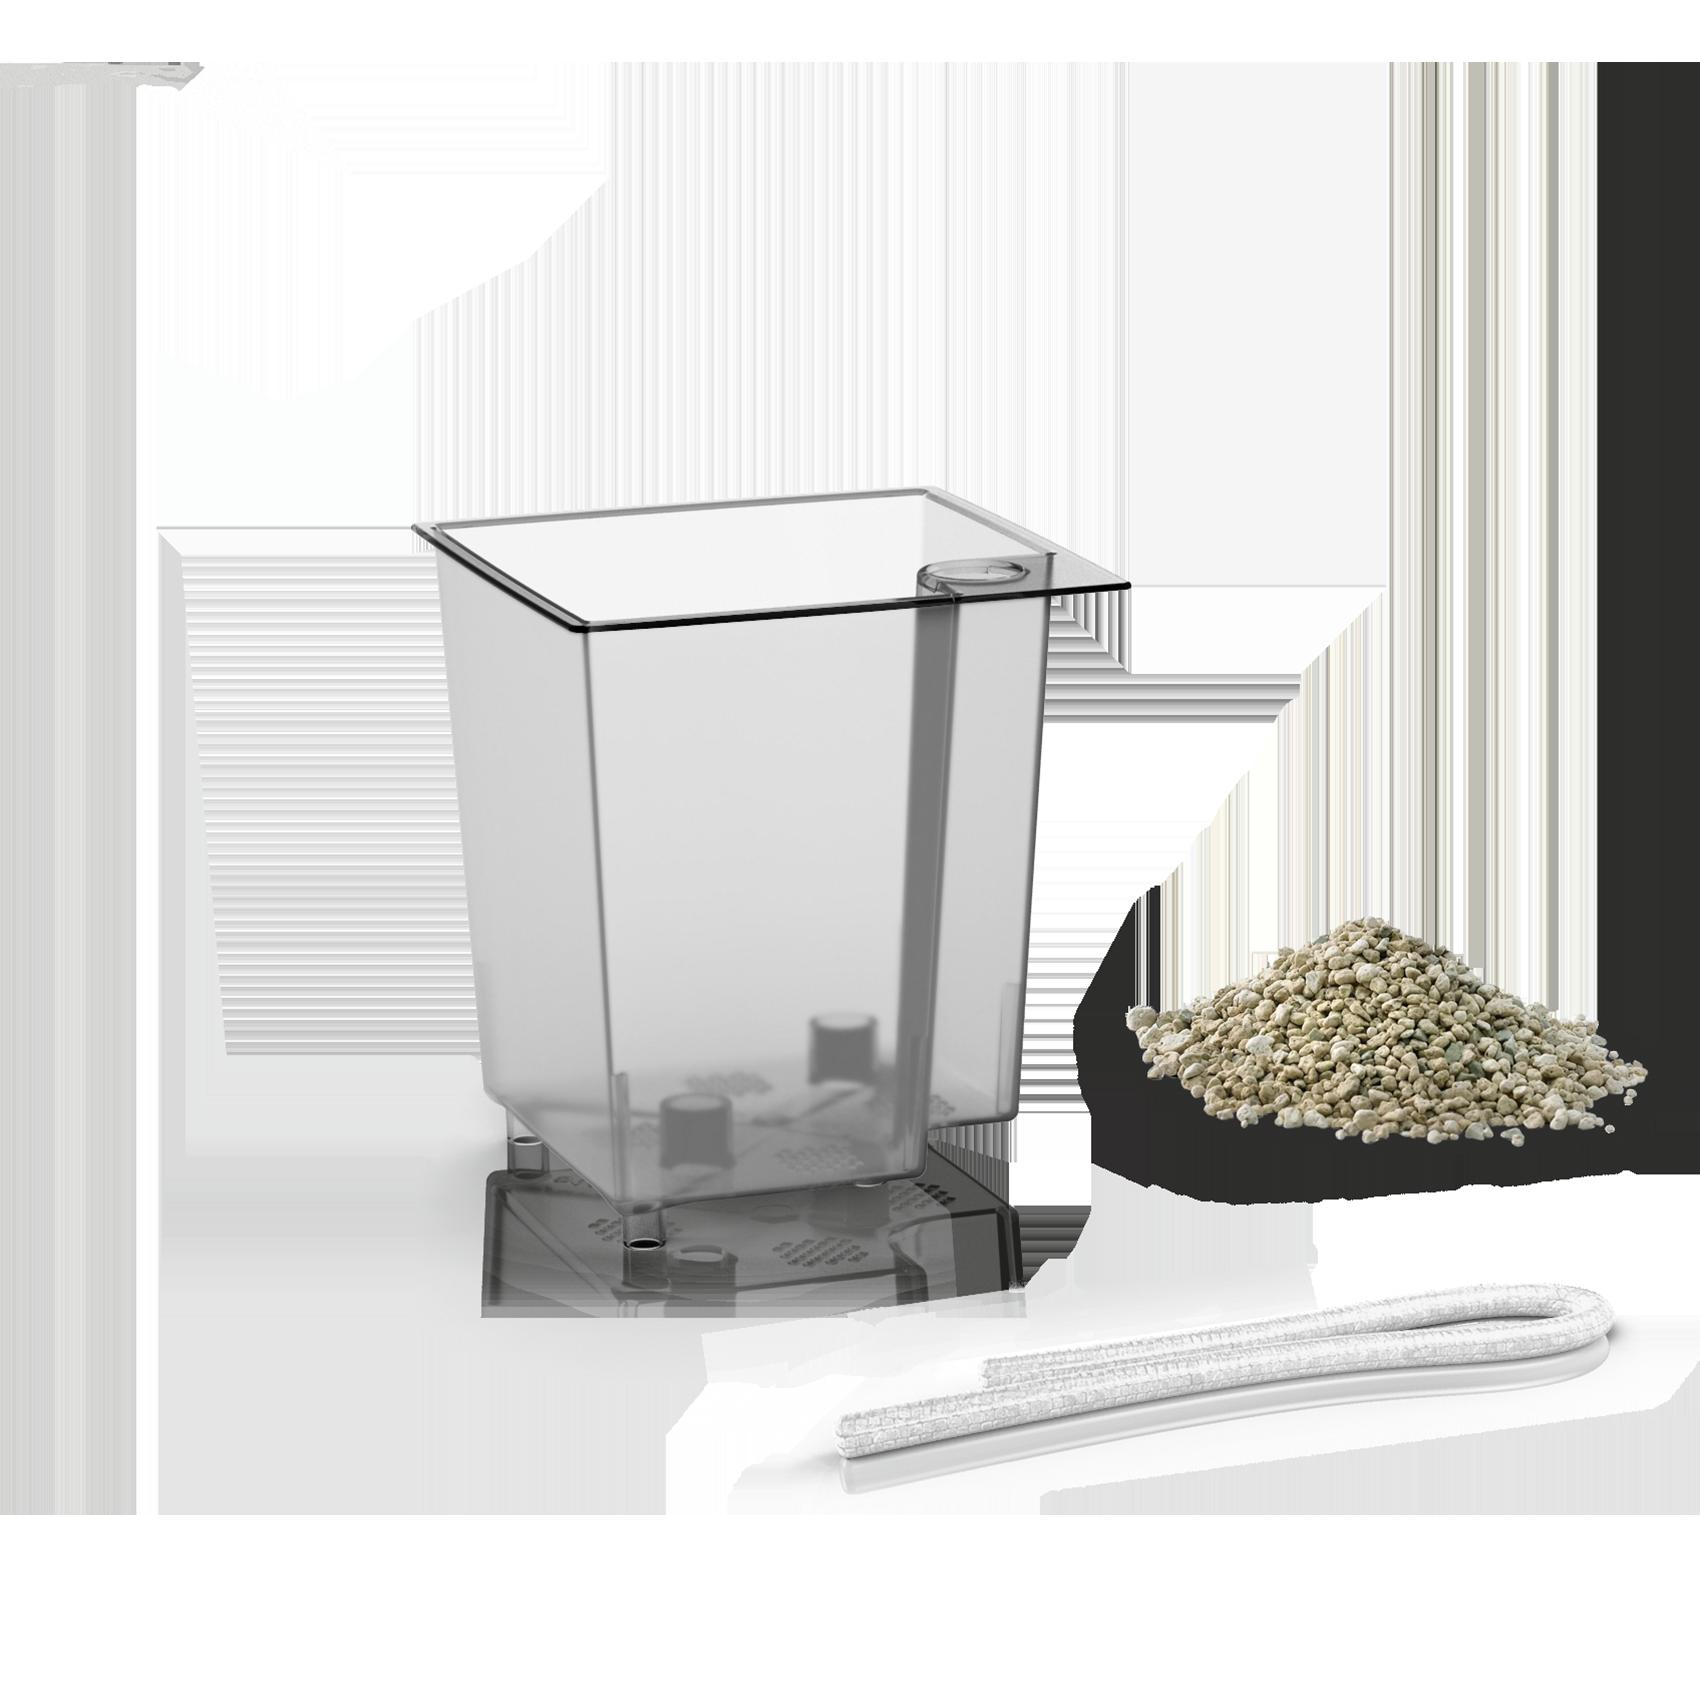 pflanzeinsatz-maxi-cubi_product_listingimage